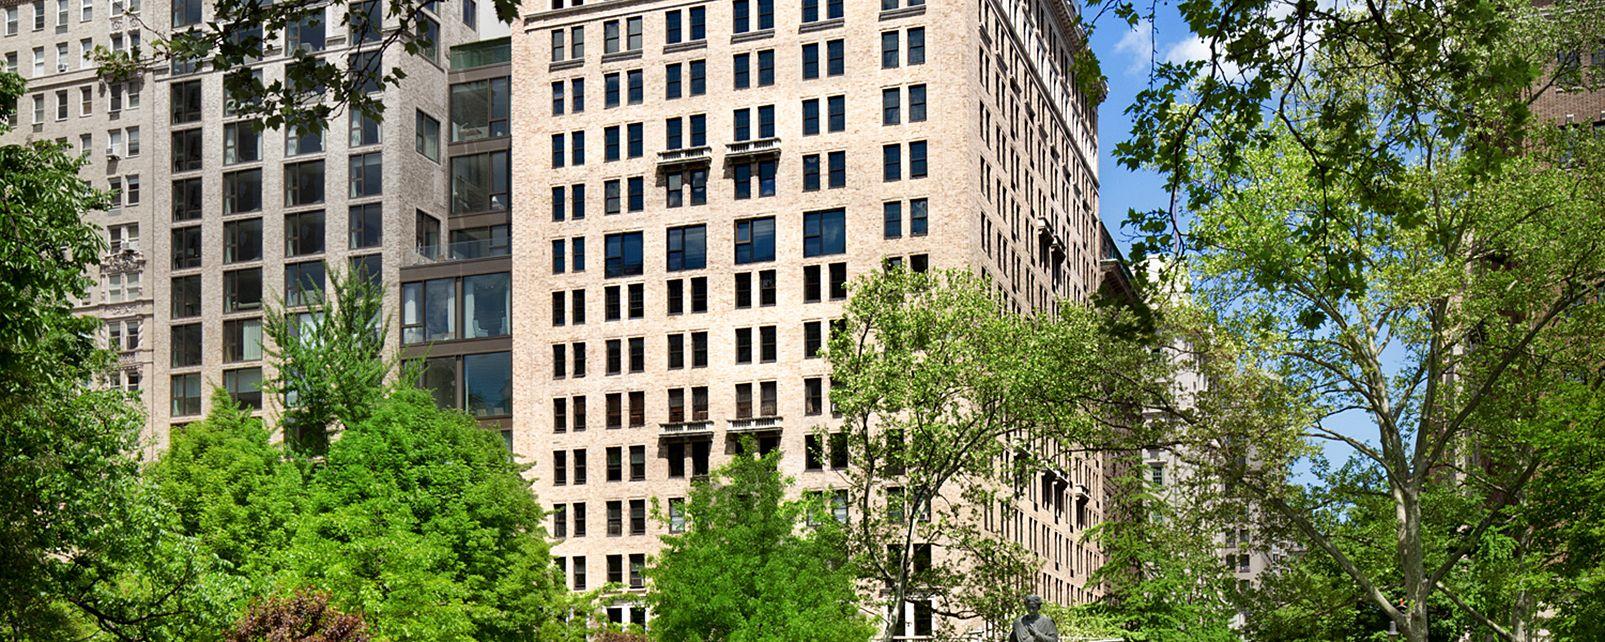 Hôtel Gramercy Park